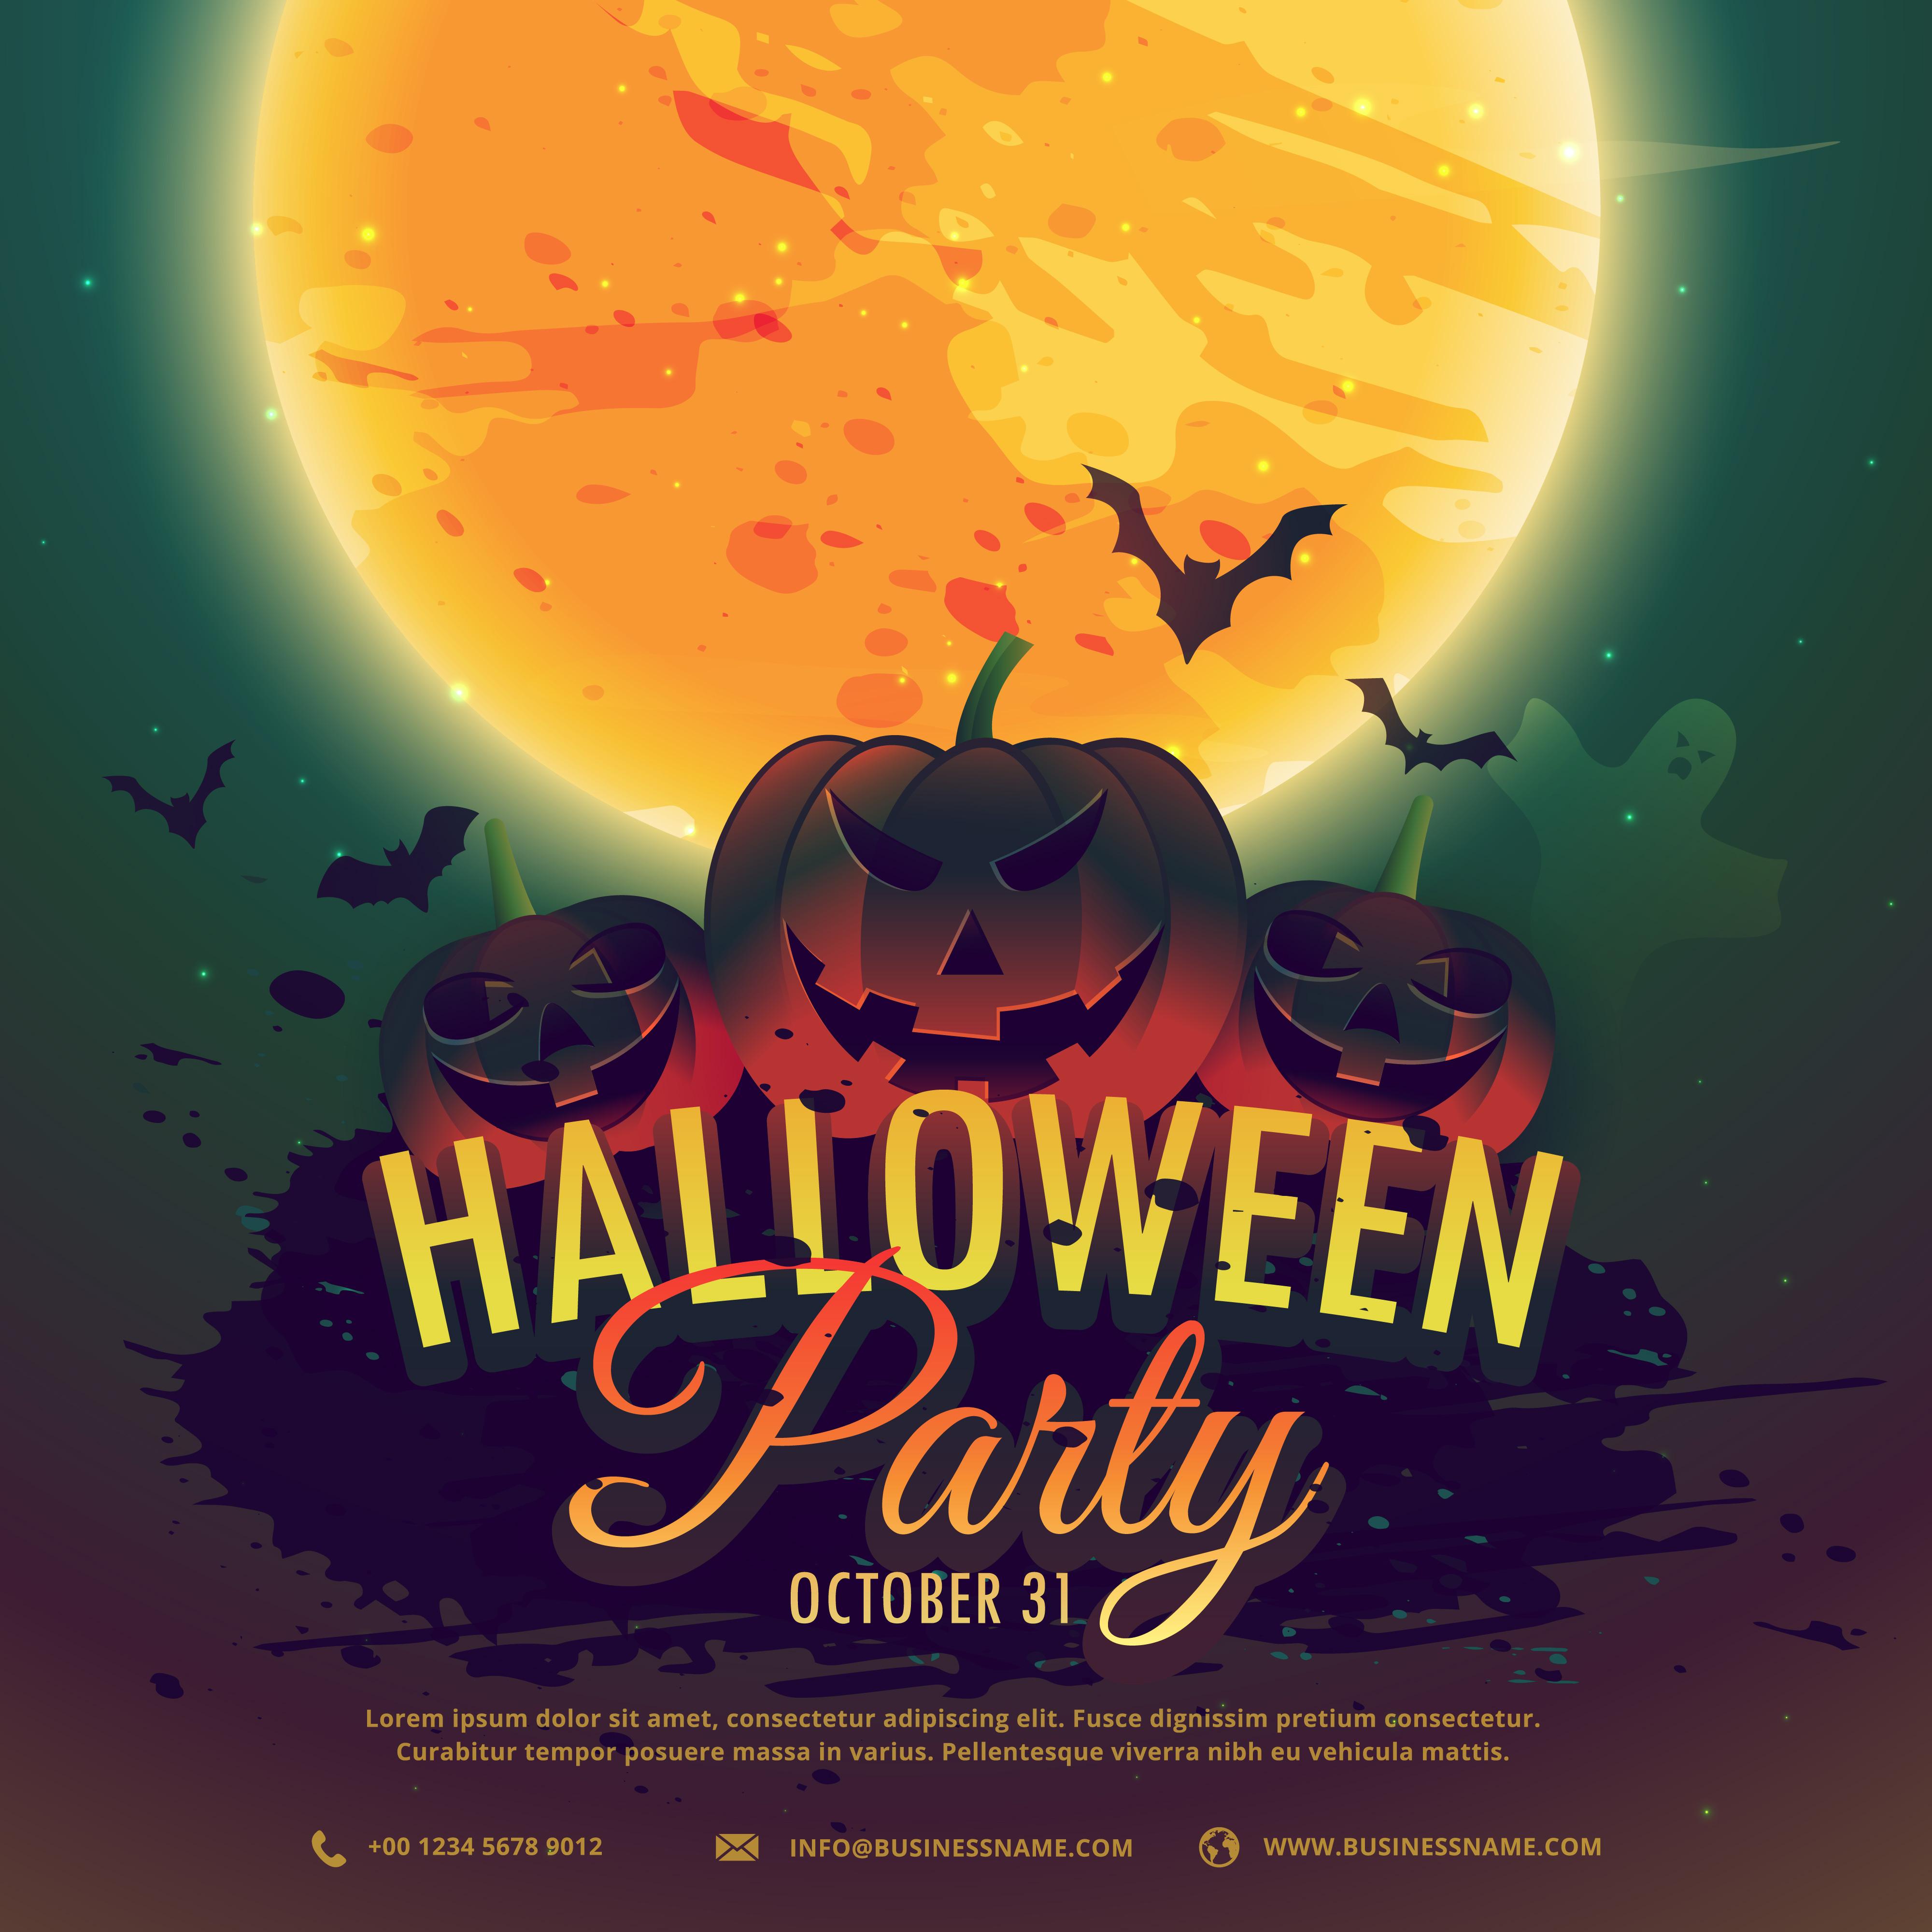 halloween party invitation background